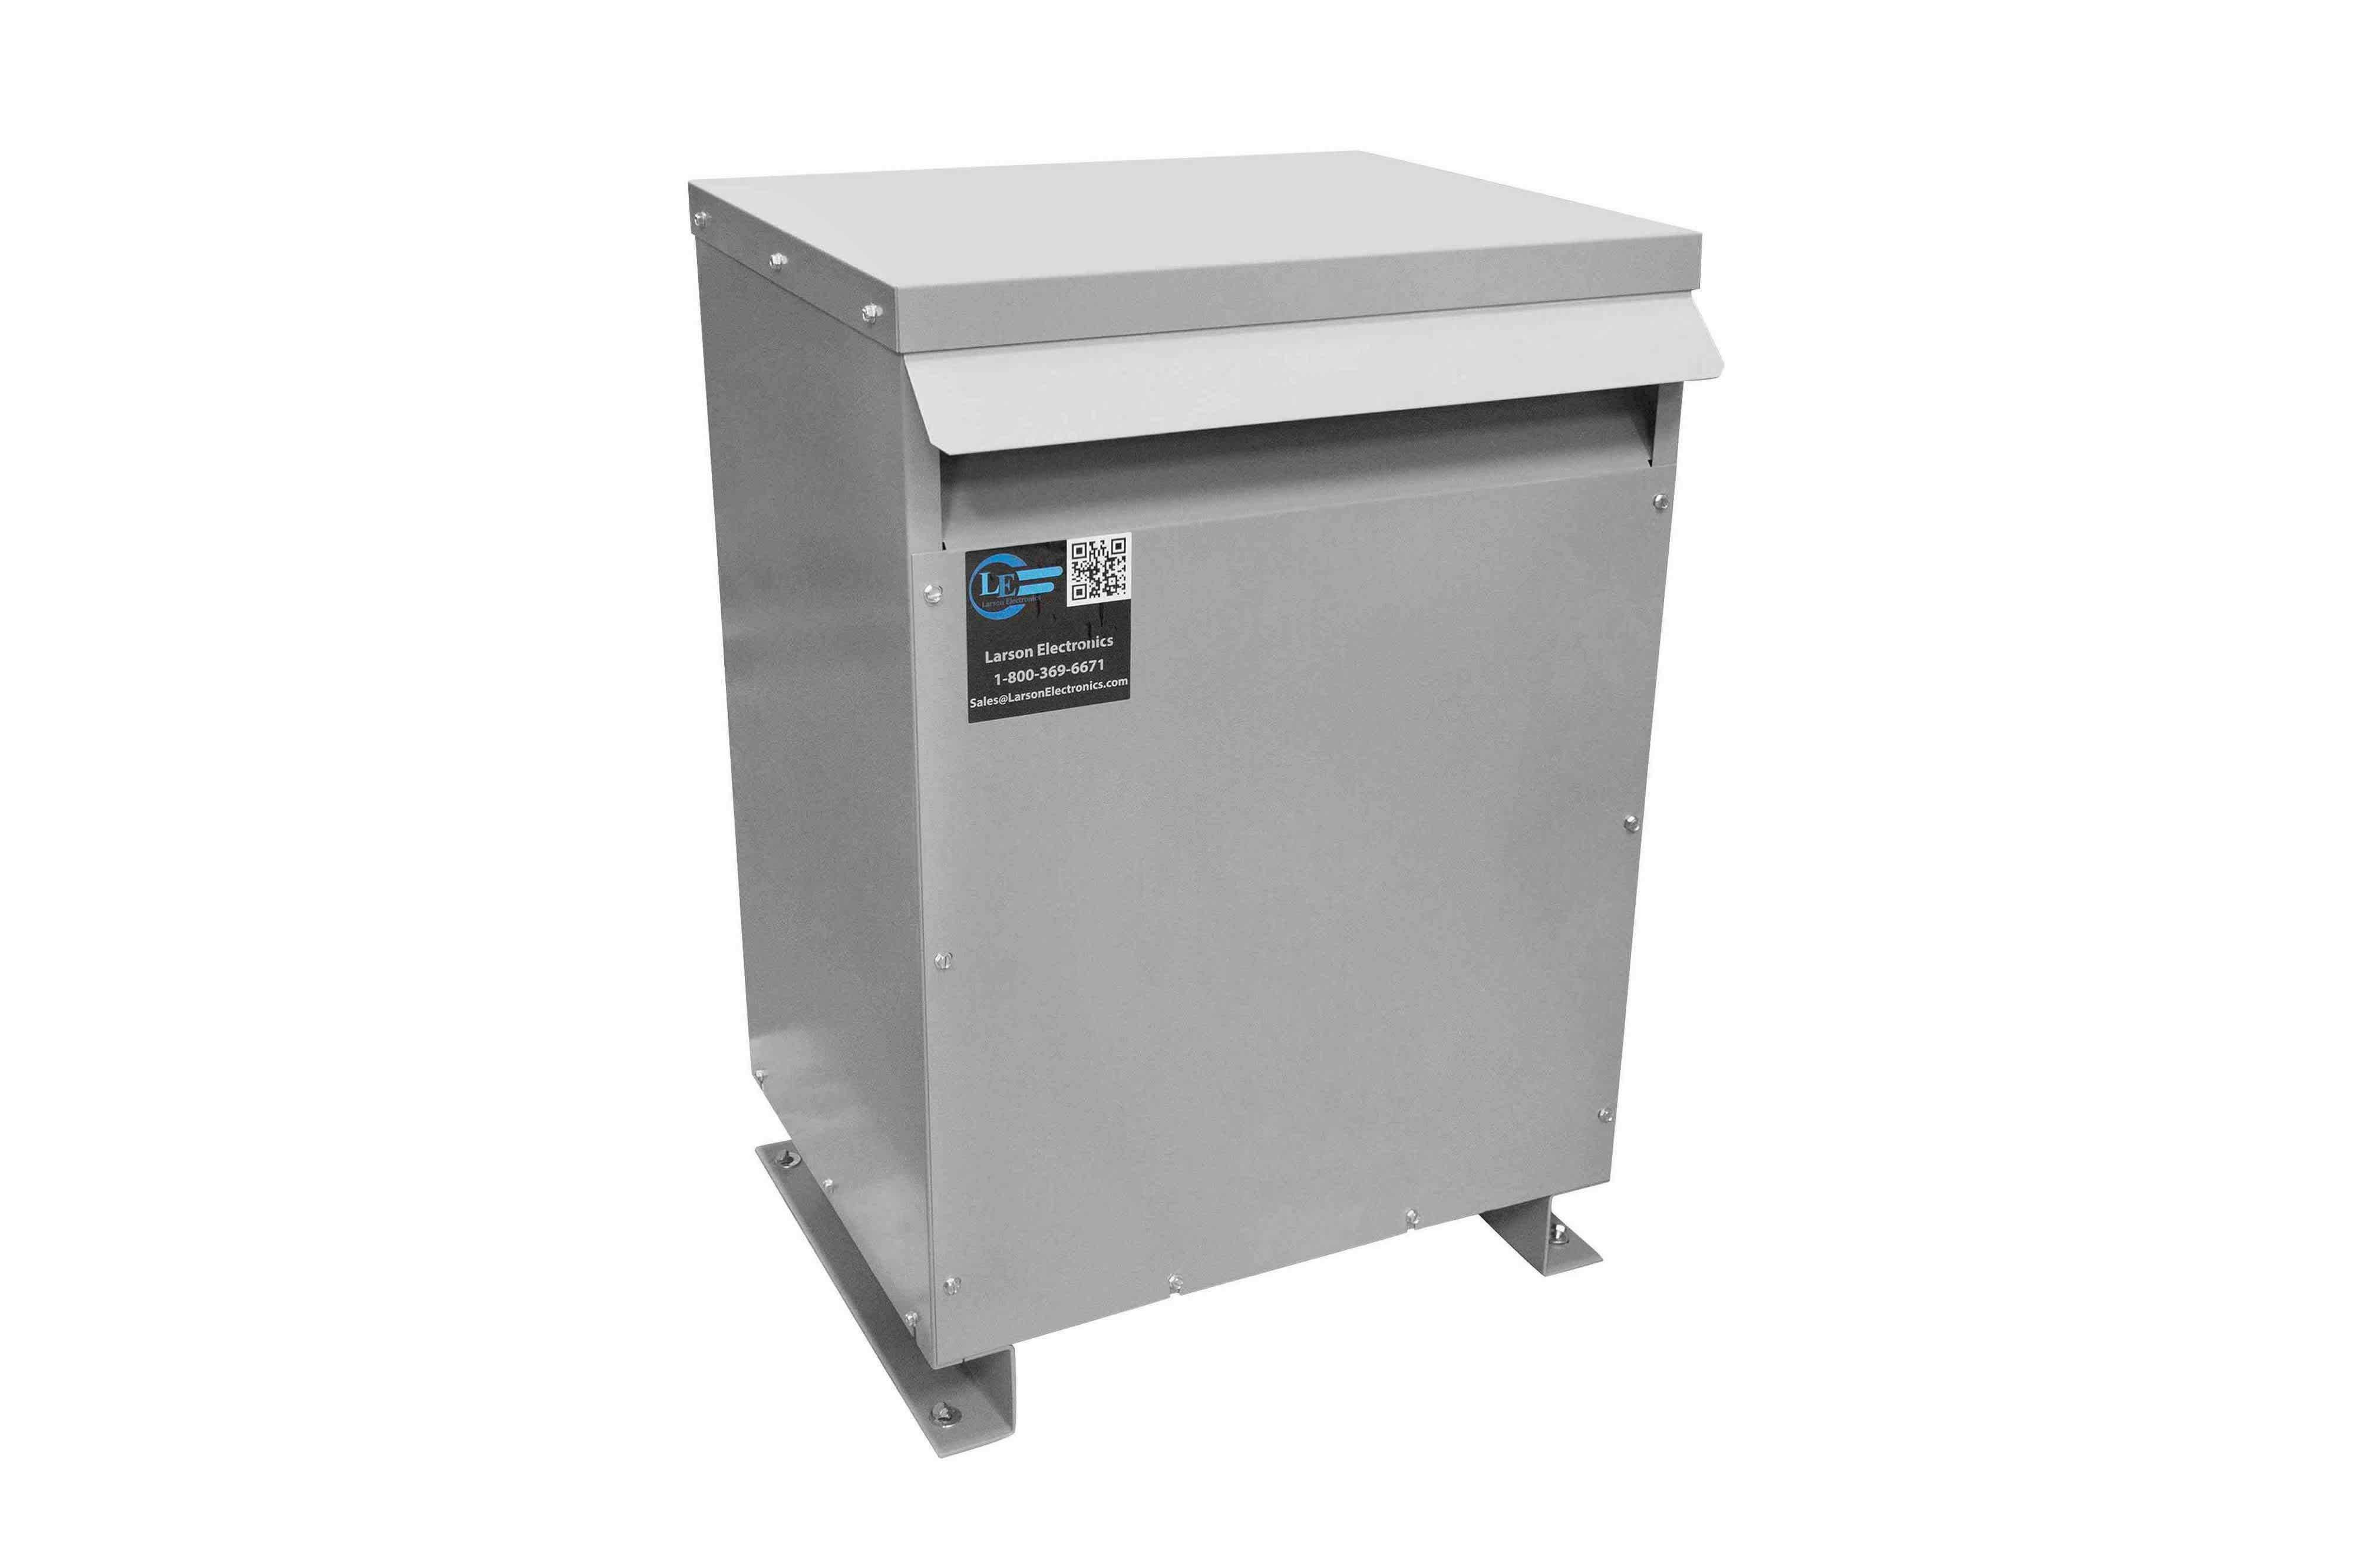 800 kVA 3PH Isolation Transformer, 400V Wye Primary, 208V Delta Secondary, N3R, Ventilated, 60 Hz